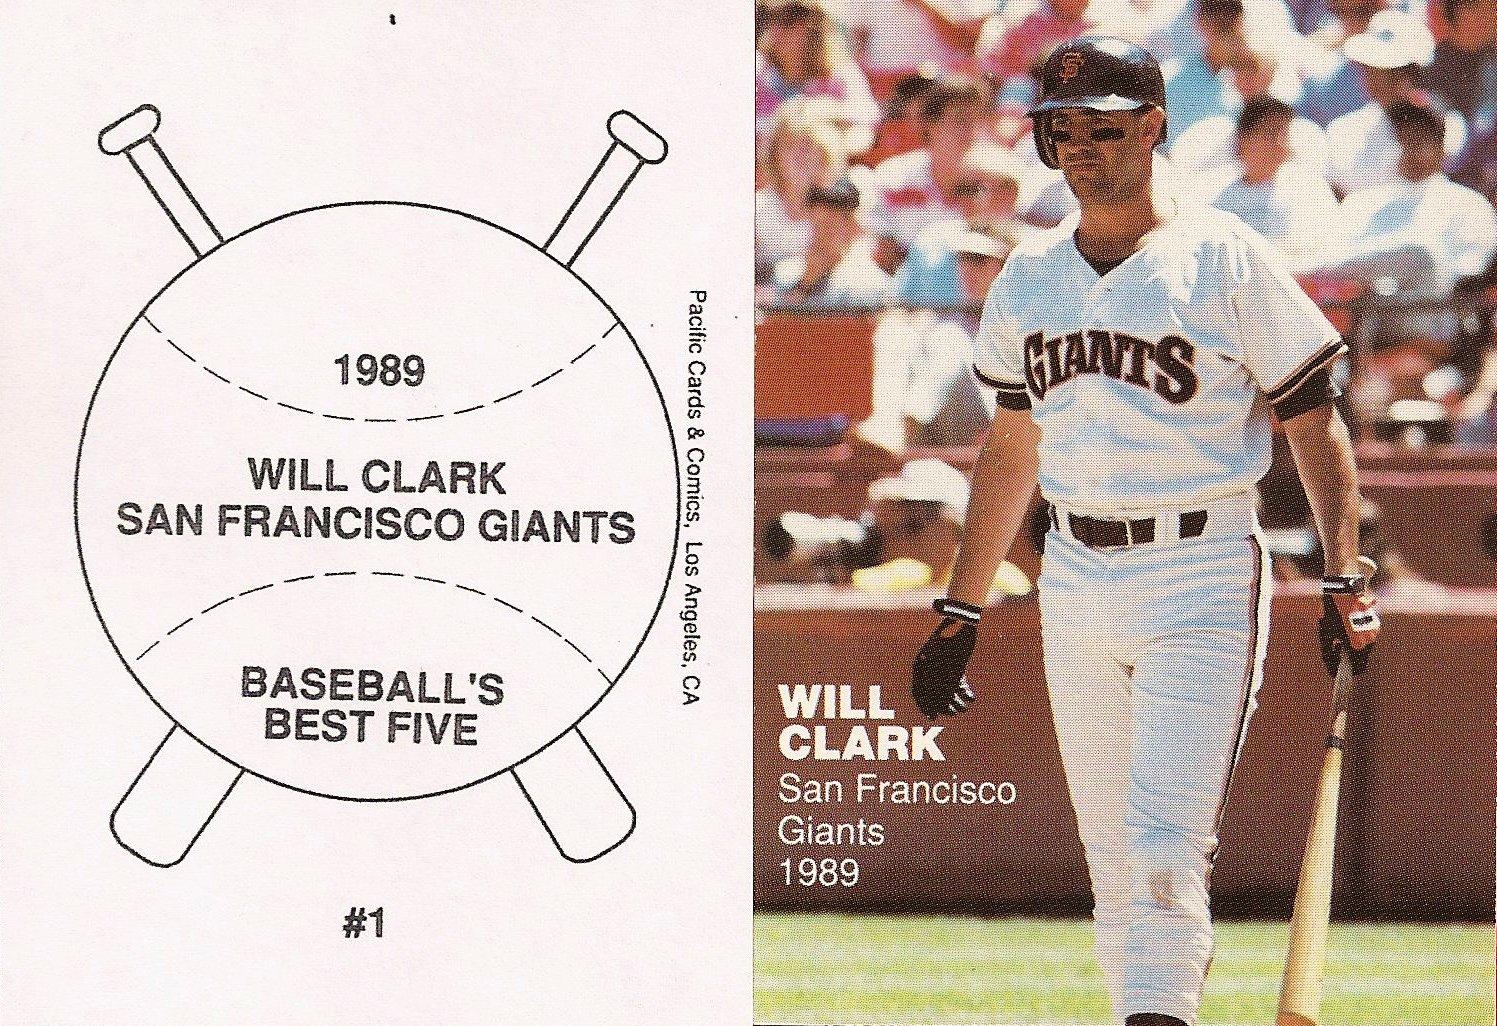 1989 Pacific Cards & Comics Baseballs Best Five